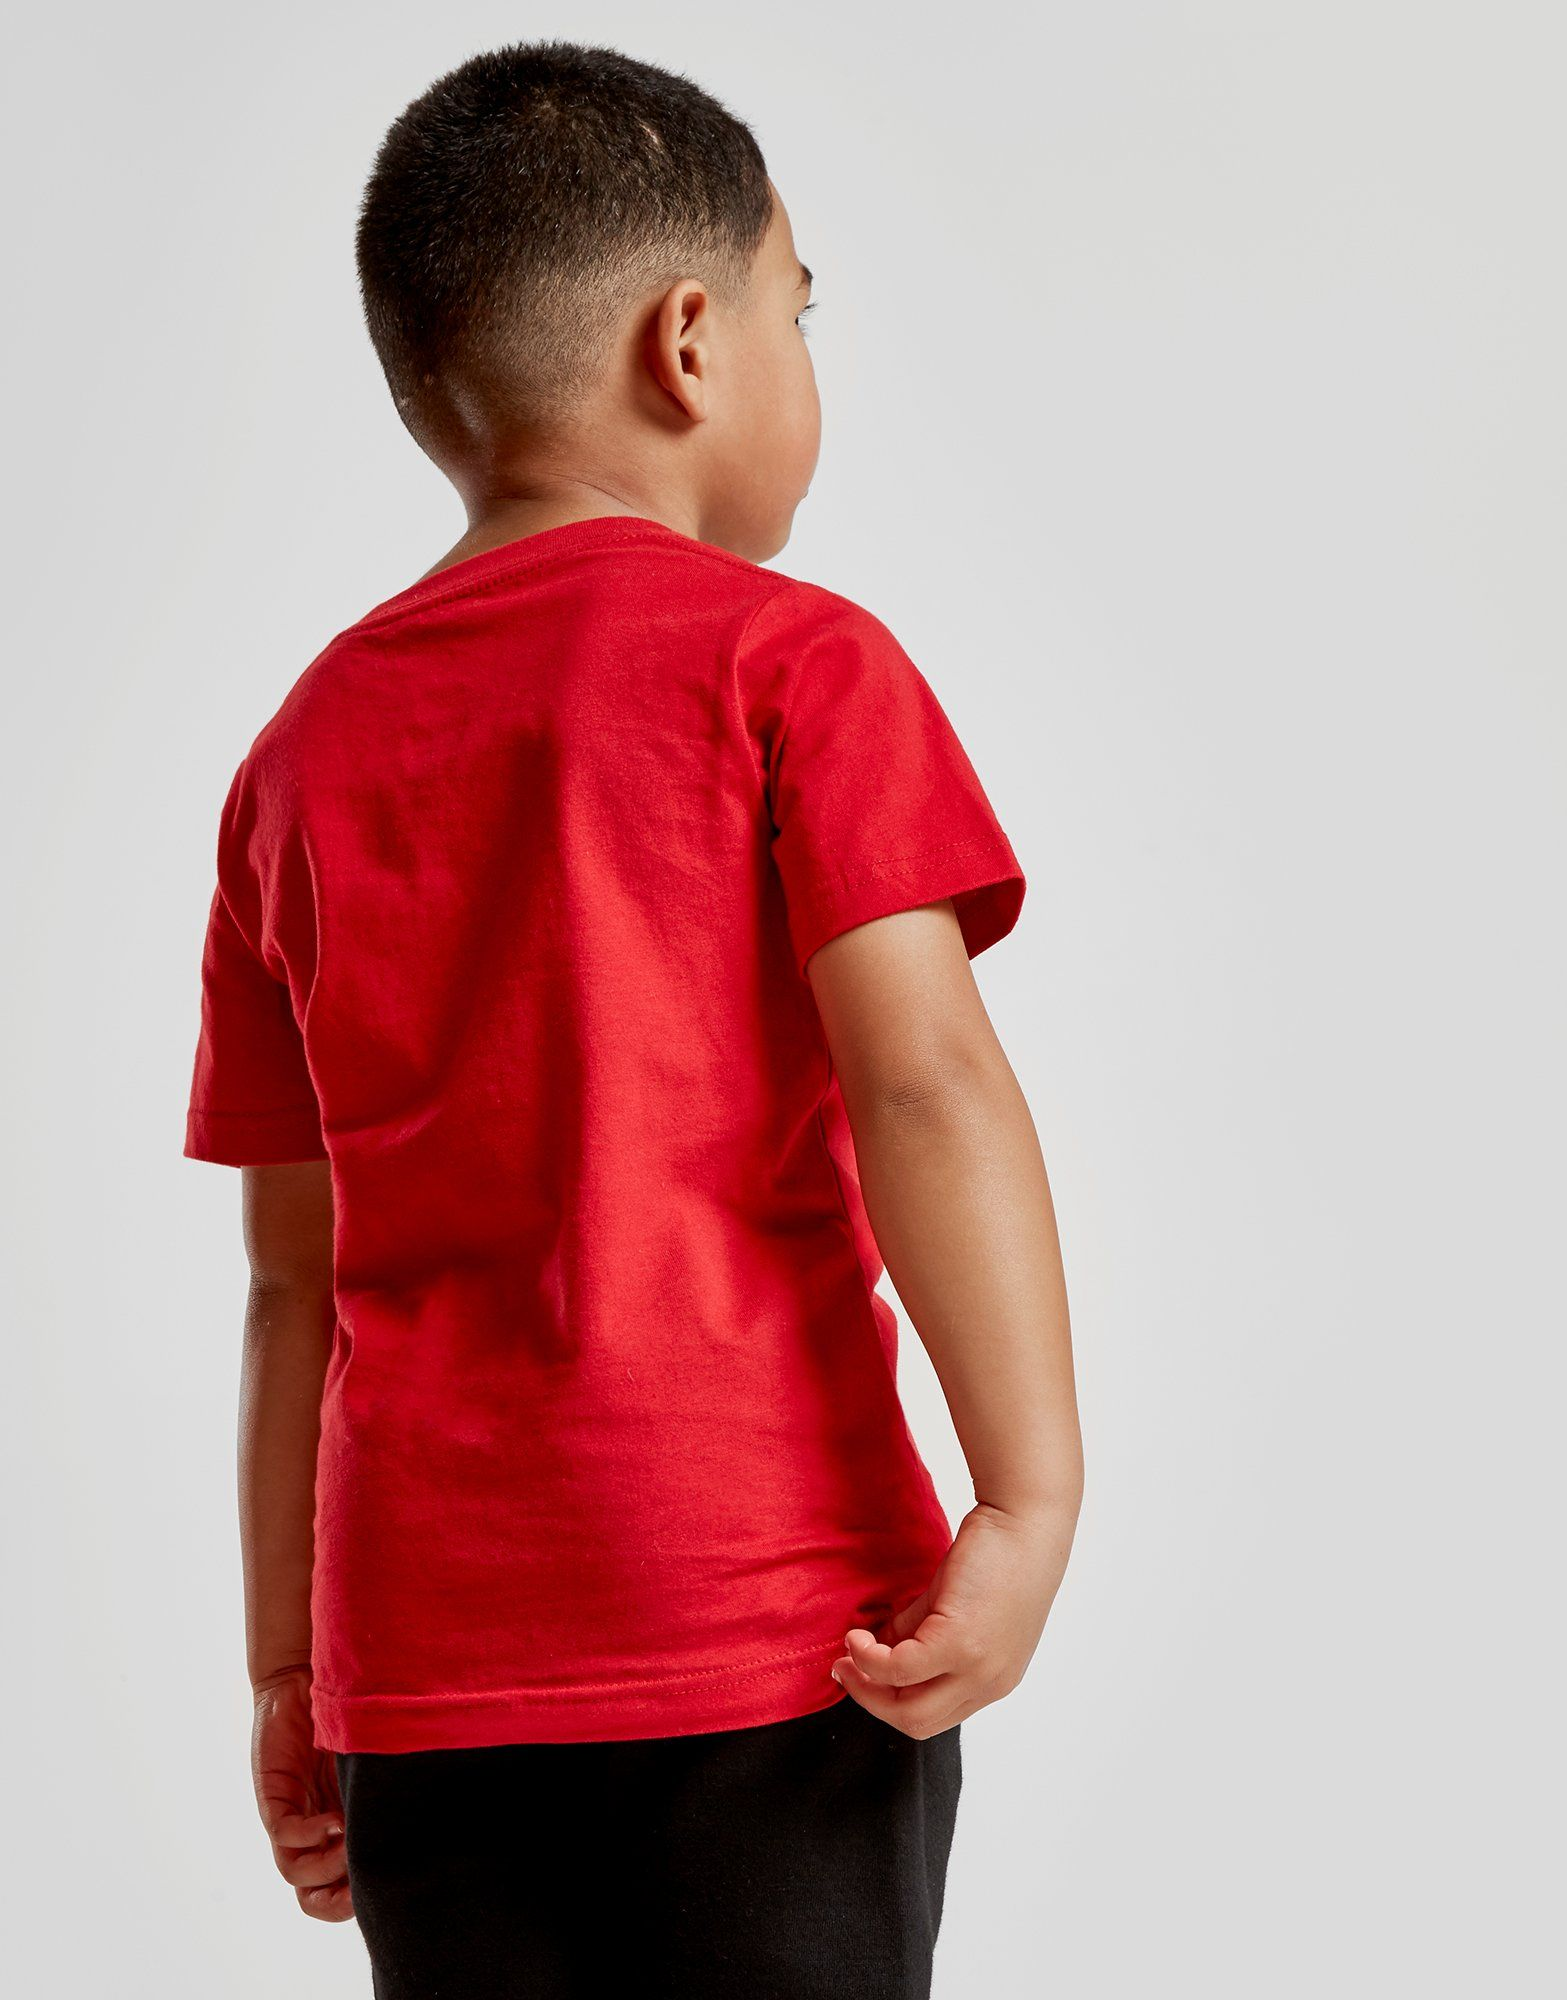 Jordan Brand 5 T-Shirt Children